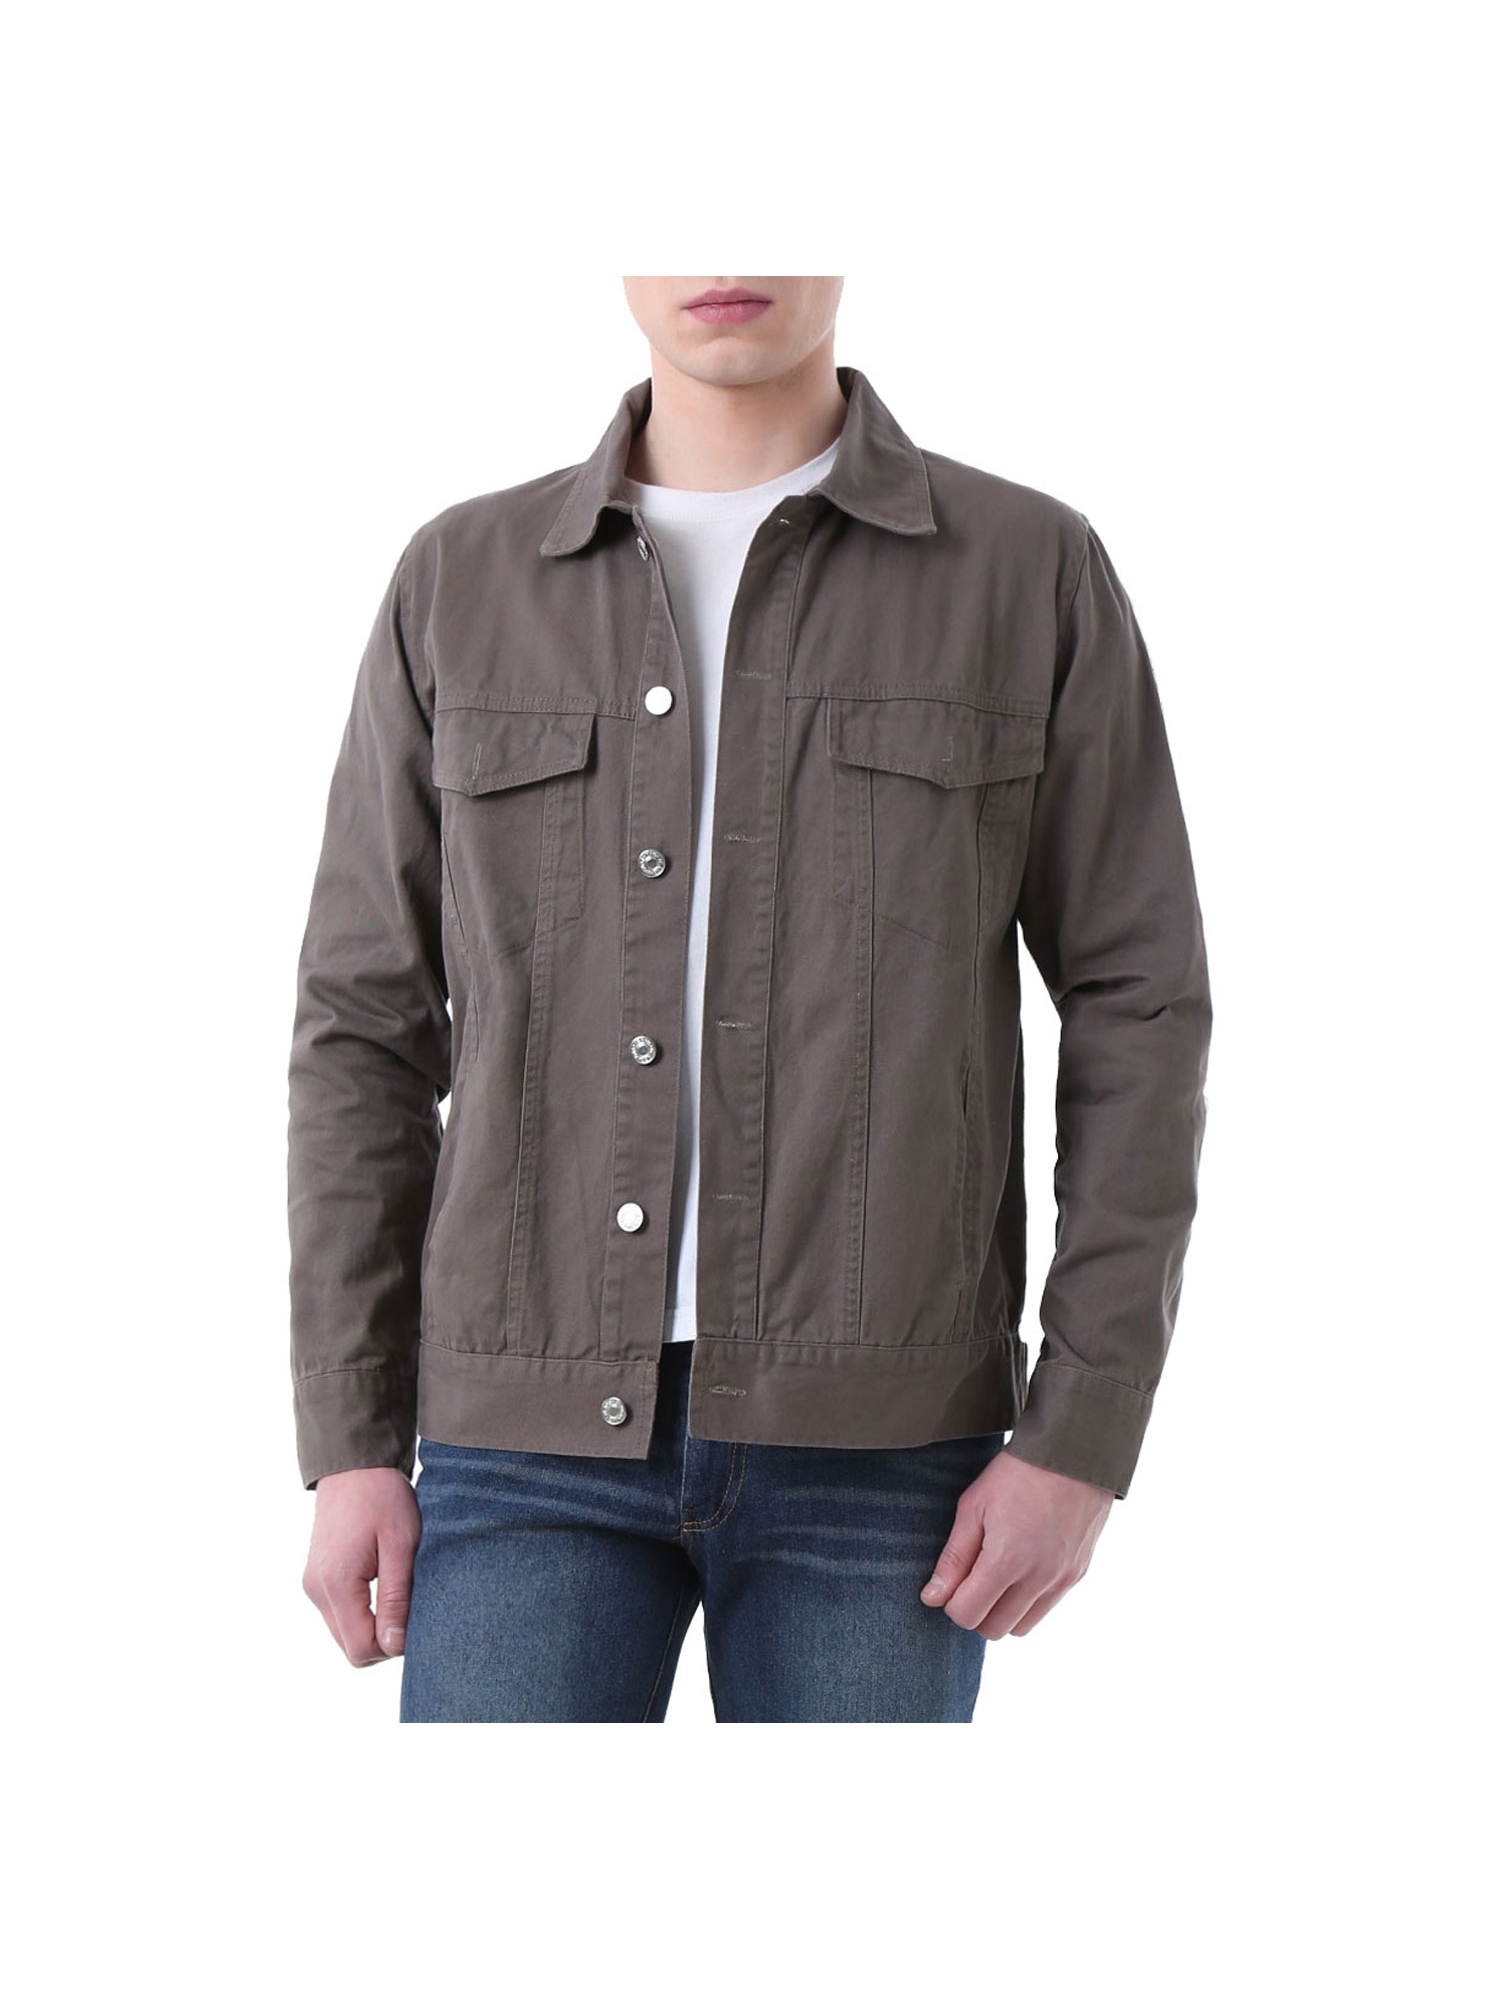 Sebaby Mens Long Sleeve Plus-Size Premium Single Breasted Denim T-Shirts